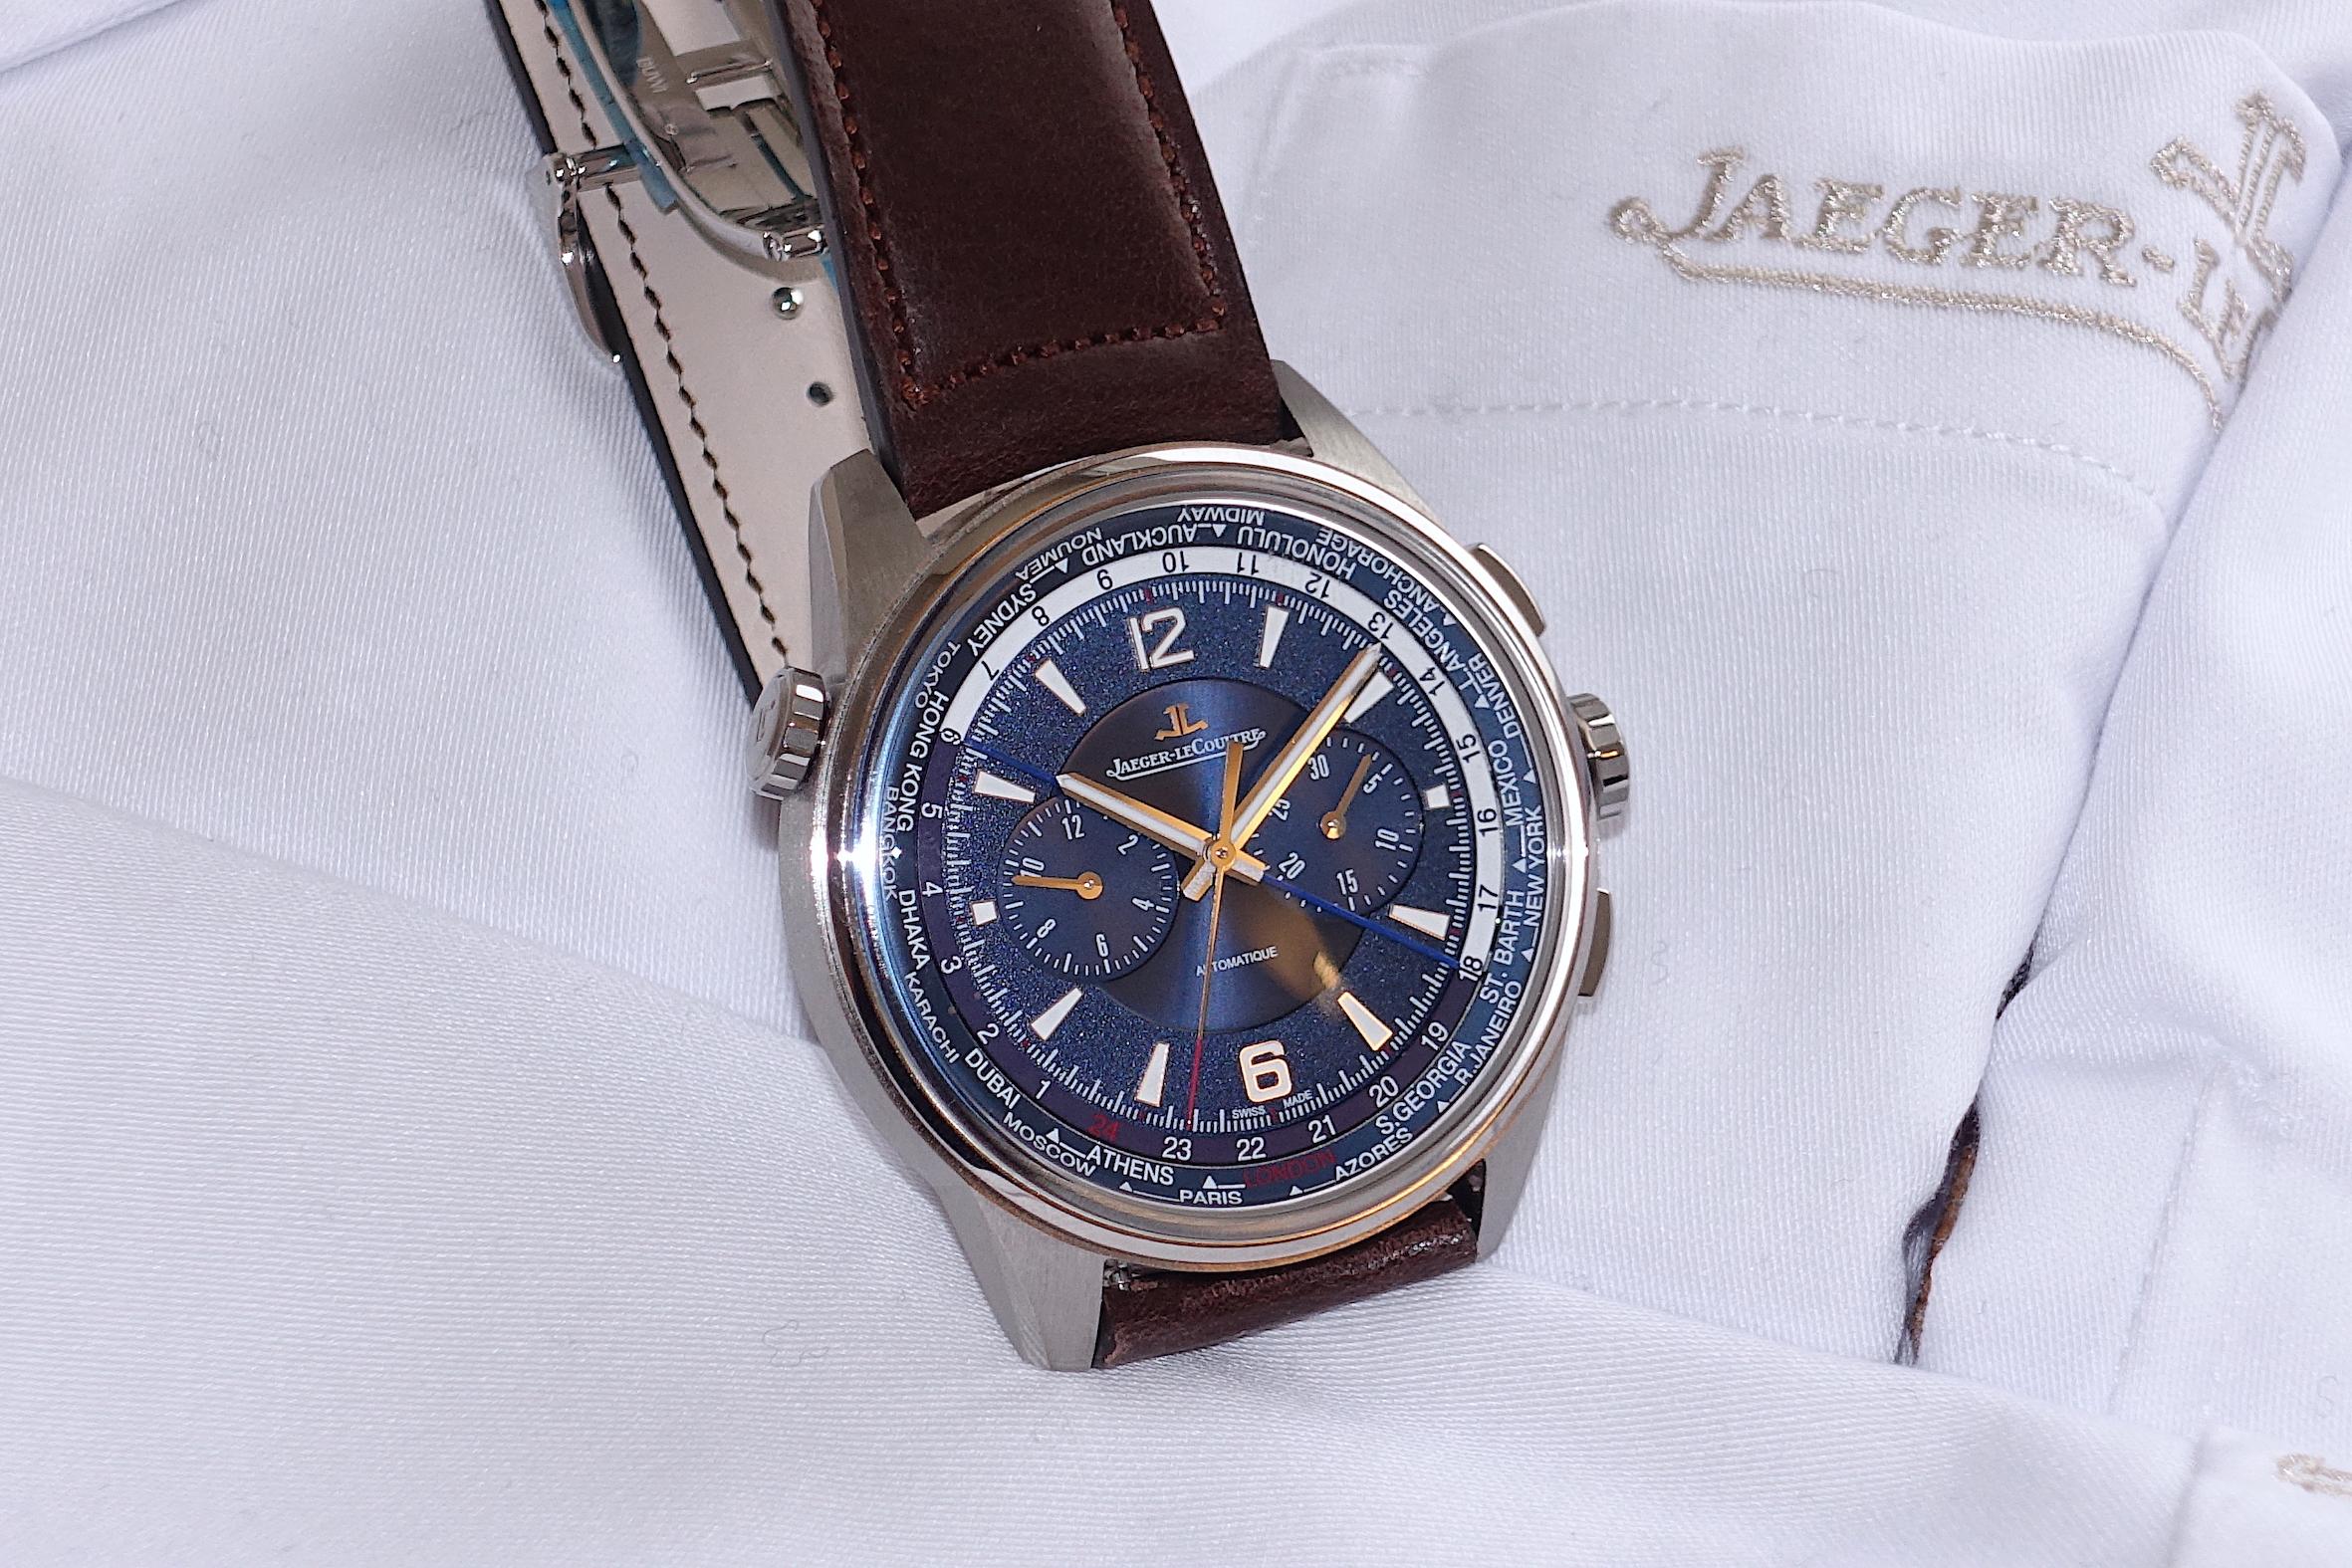 Jaeger-LeCoultre 'Polaris Chronograph World Time'